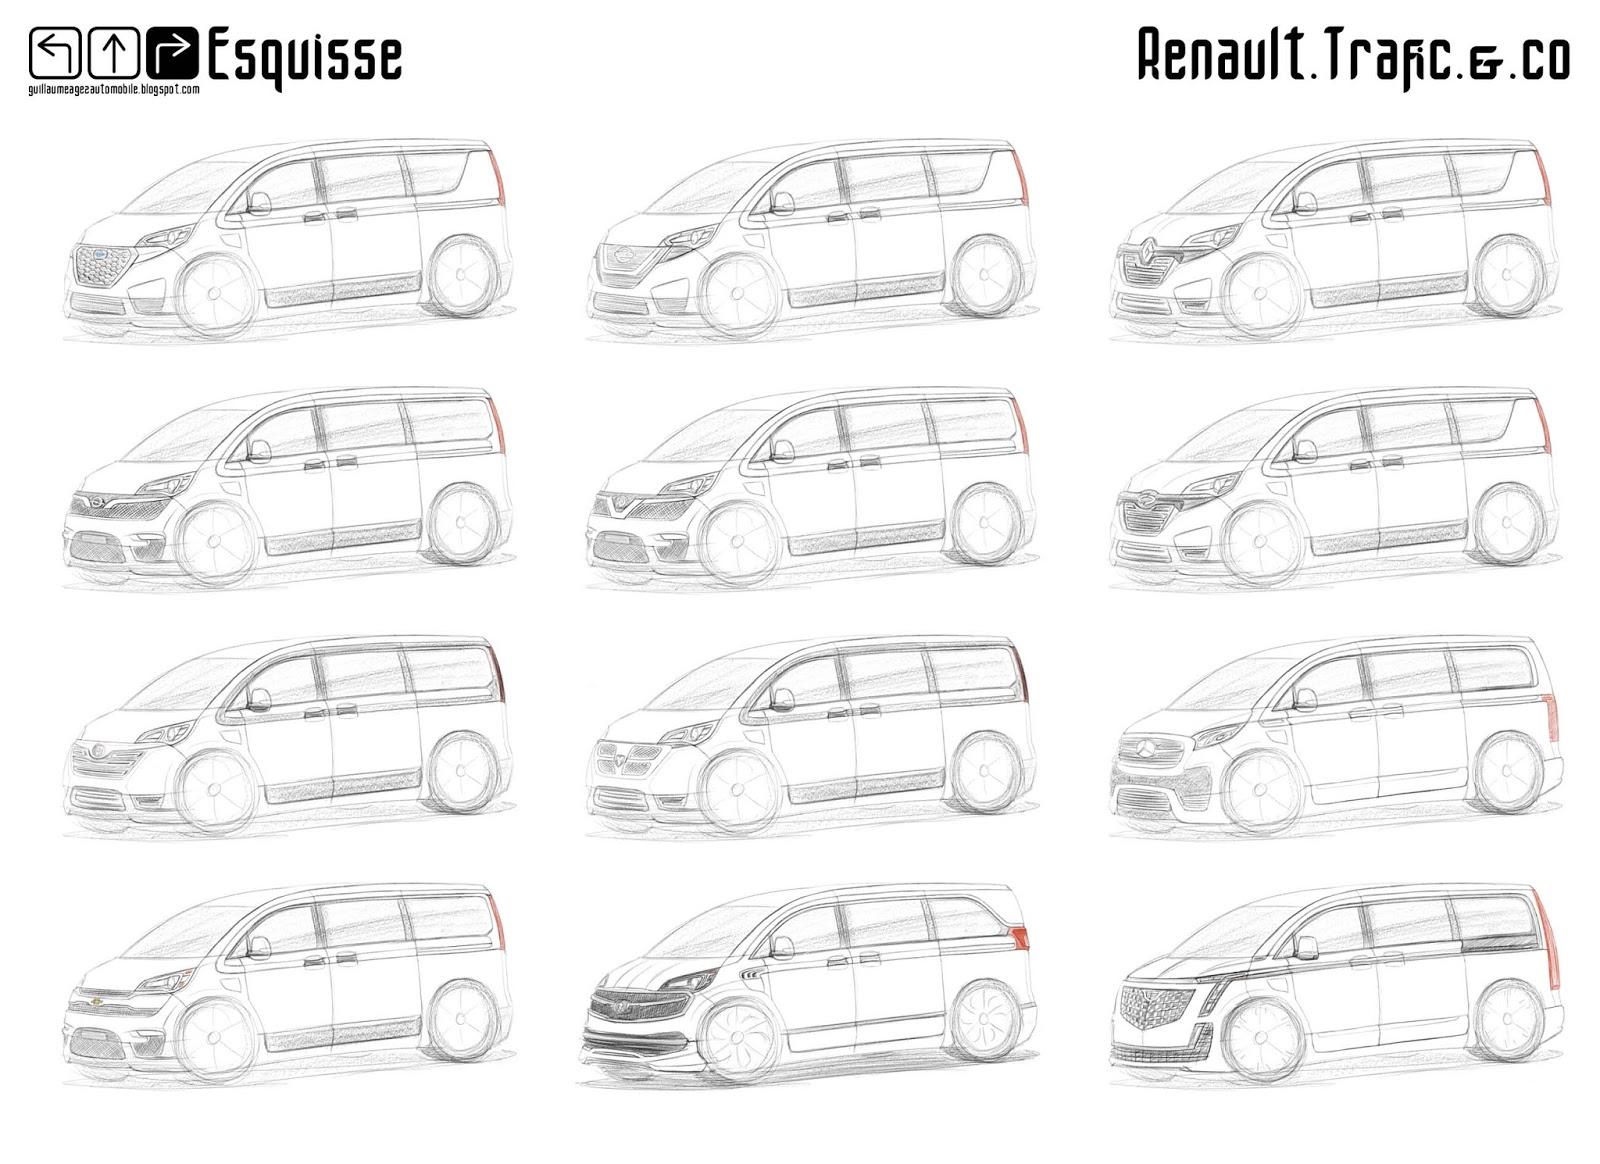 Guillaume Agez Automobile Esquisse Renault Trafic Iv